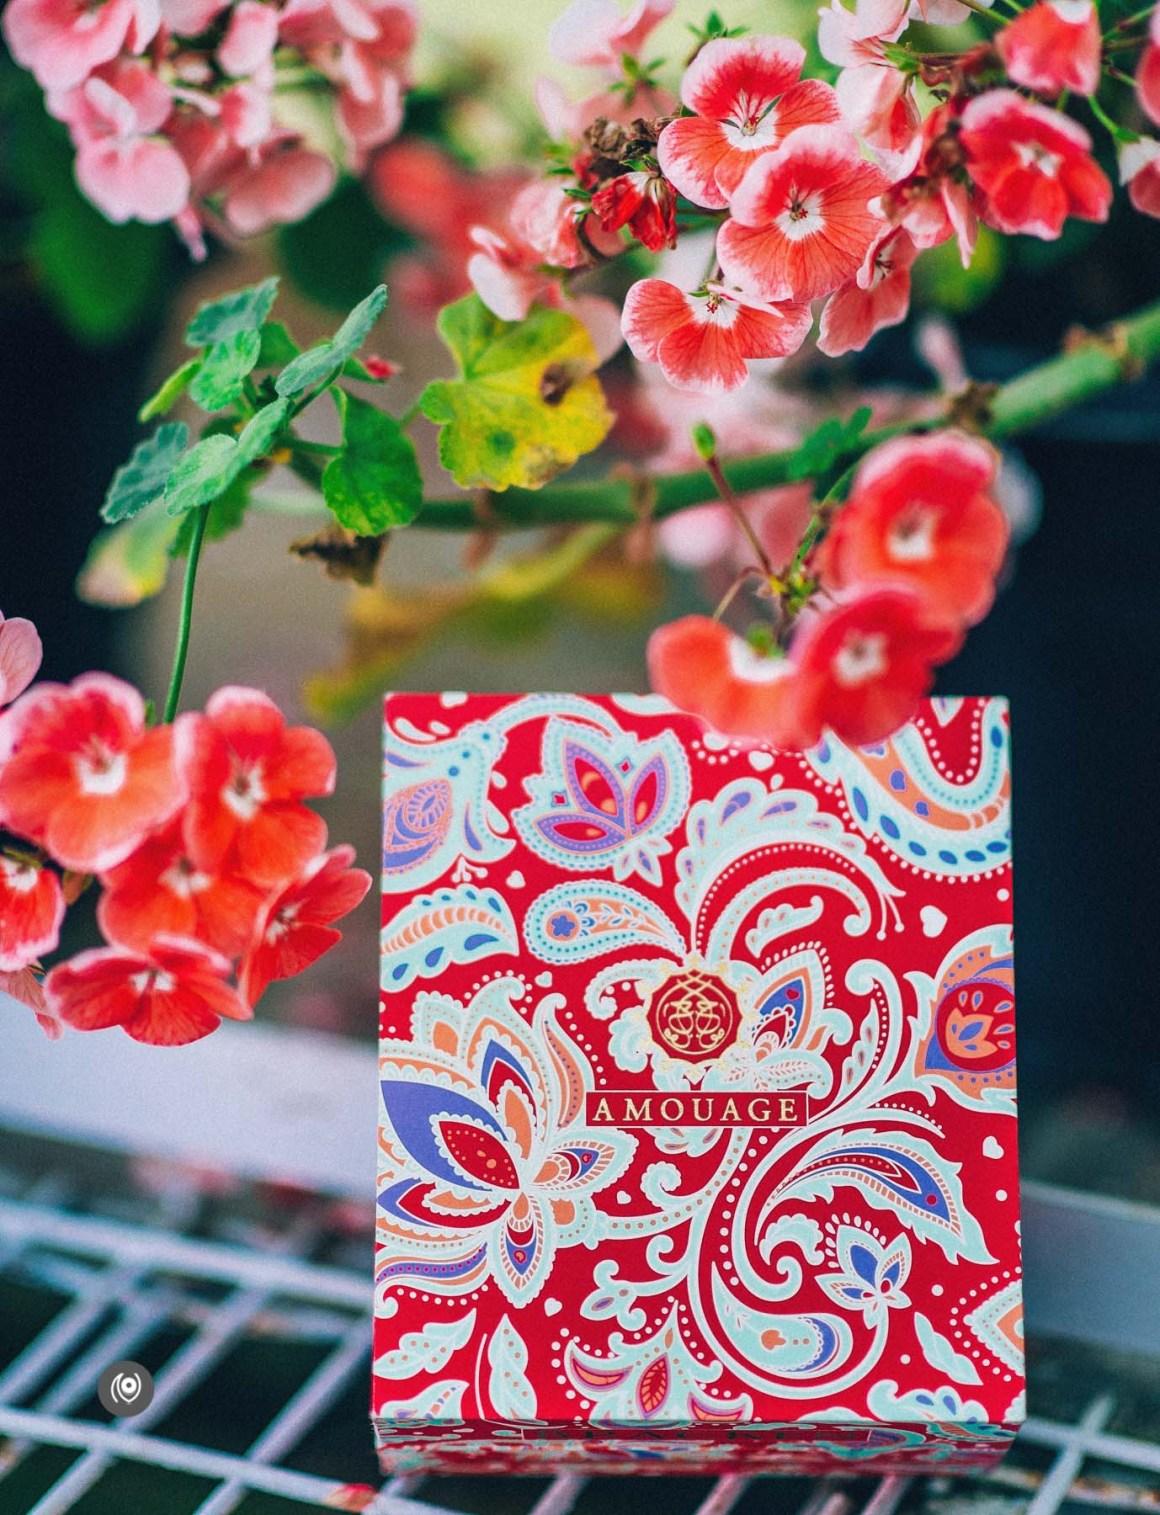 Naina Redhu, Naina.co, #FragranceOfTheMonth, ScentSutra, Bracken, Amouage, Midnight Flower Collection, Bracken Women, Perfume, Artisanal Fragrances, Exquisite Perfume, Luxury, Niche, EyesForLuxury, EyesForDestinations, Mussoorie, JW Marriott, Marriott International, Walnut Grove, Resort, Spa, Cedar Spa, Uttarakhand, Mussoorie, Tourism, Travel, India, EyesForIndia, Content Strategist, Content Strategy, Incredible India, Digital Strategy, Online Strategy, Content Queen, Marriott Mussoorie, Content Queen, Lifestyle Photographer, Photography, Professional Photographer, Lifestyle Blogger, Lifestyle Content, Travel Blogger, Travel Photographer, Travel Content